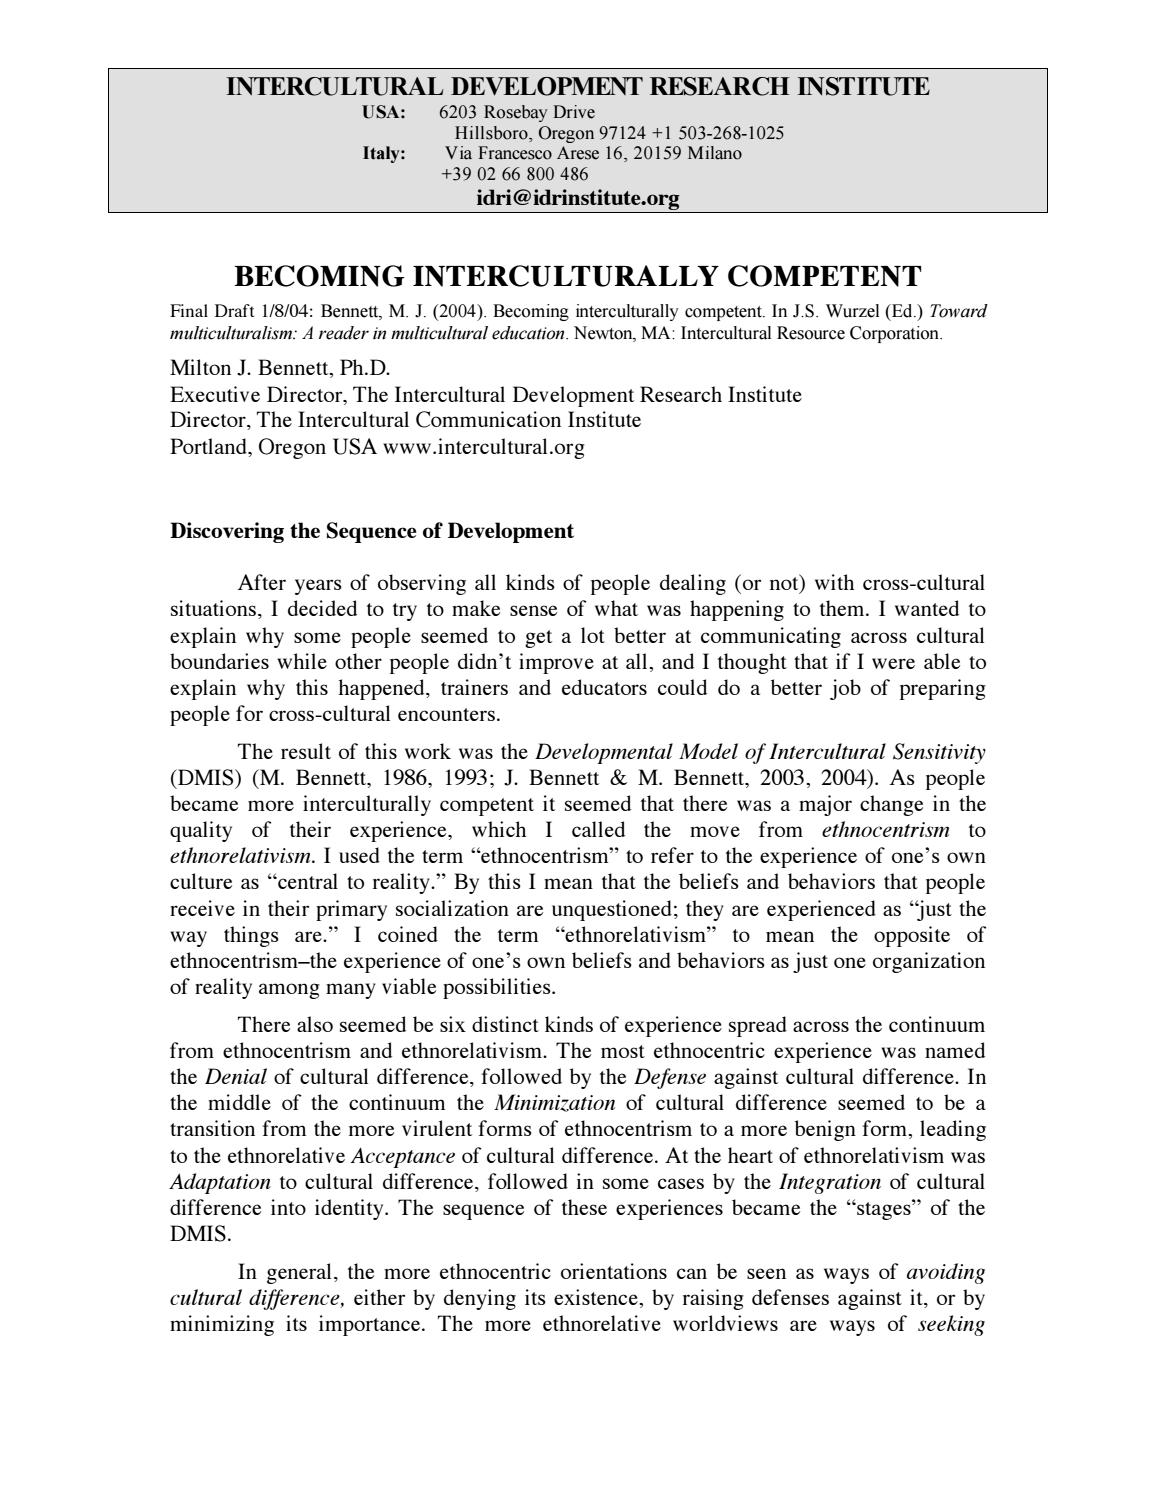 towards ethnorelativism - milton j bennett essay Expat intercultural sensitivity development - bennett's scale of ethnorelativism expat intercultural sensitivity development - bennett's scale of ethnorelativism.